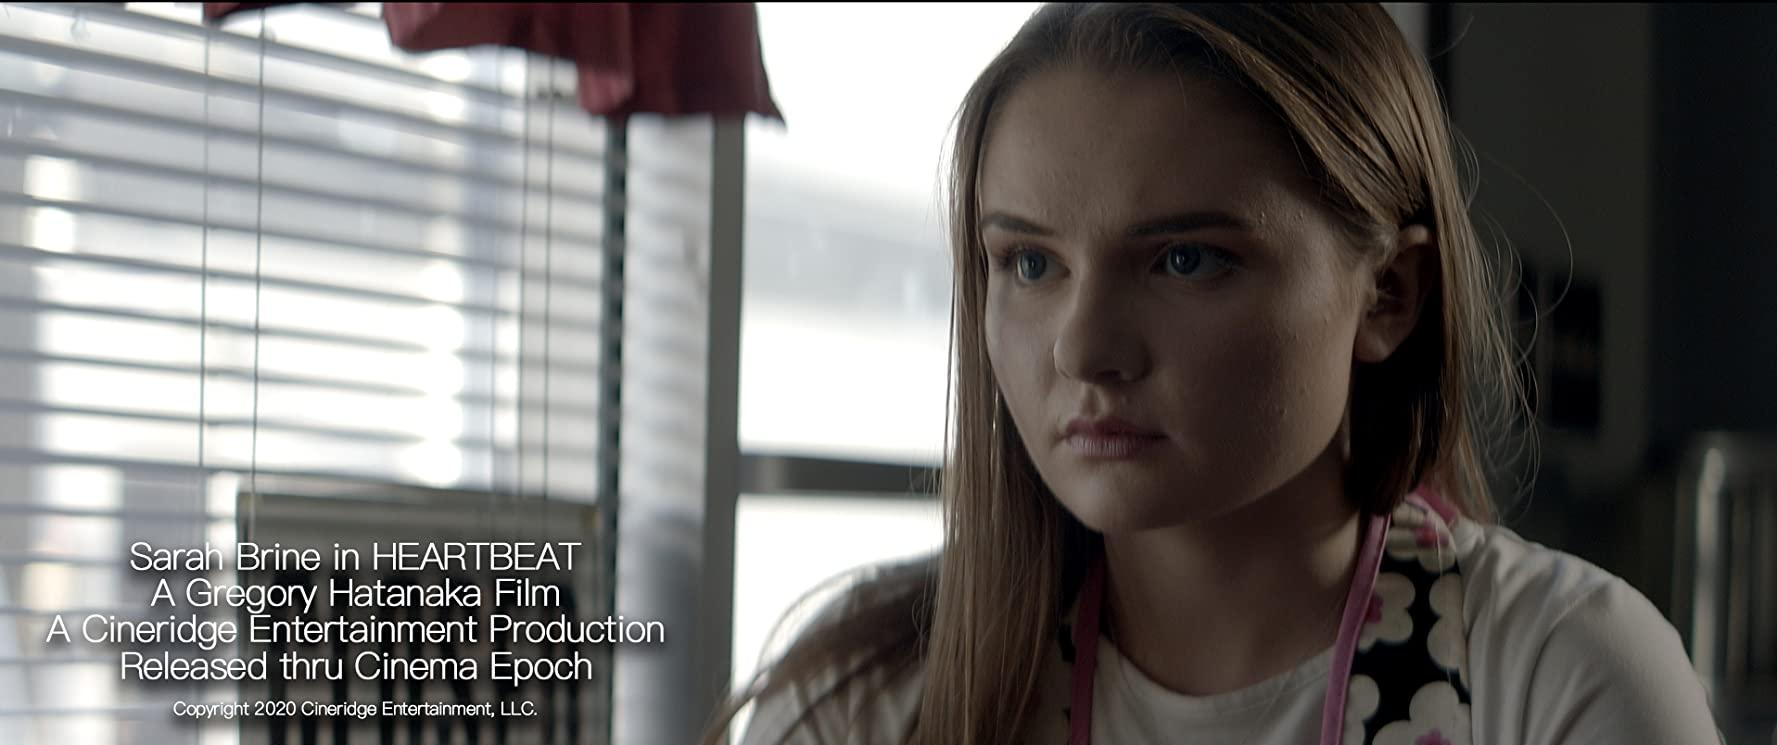 مشاهدة فيلم Heartbeat (2020) مترجم HD اون لاين